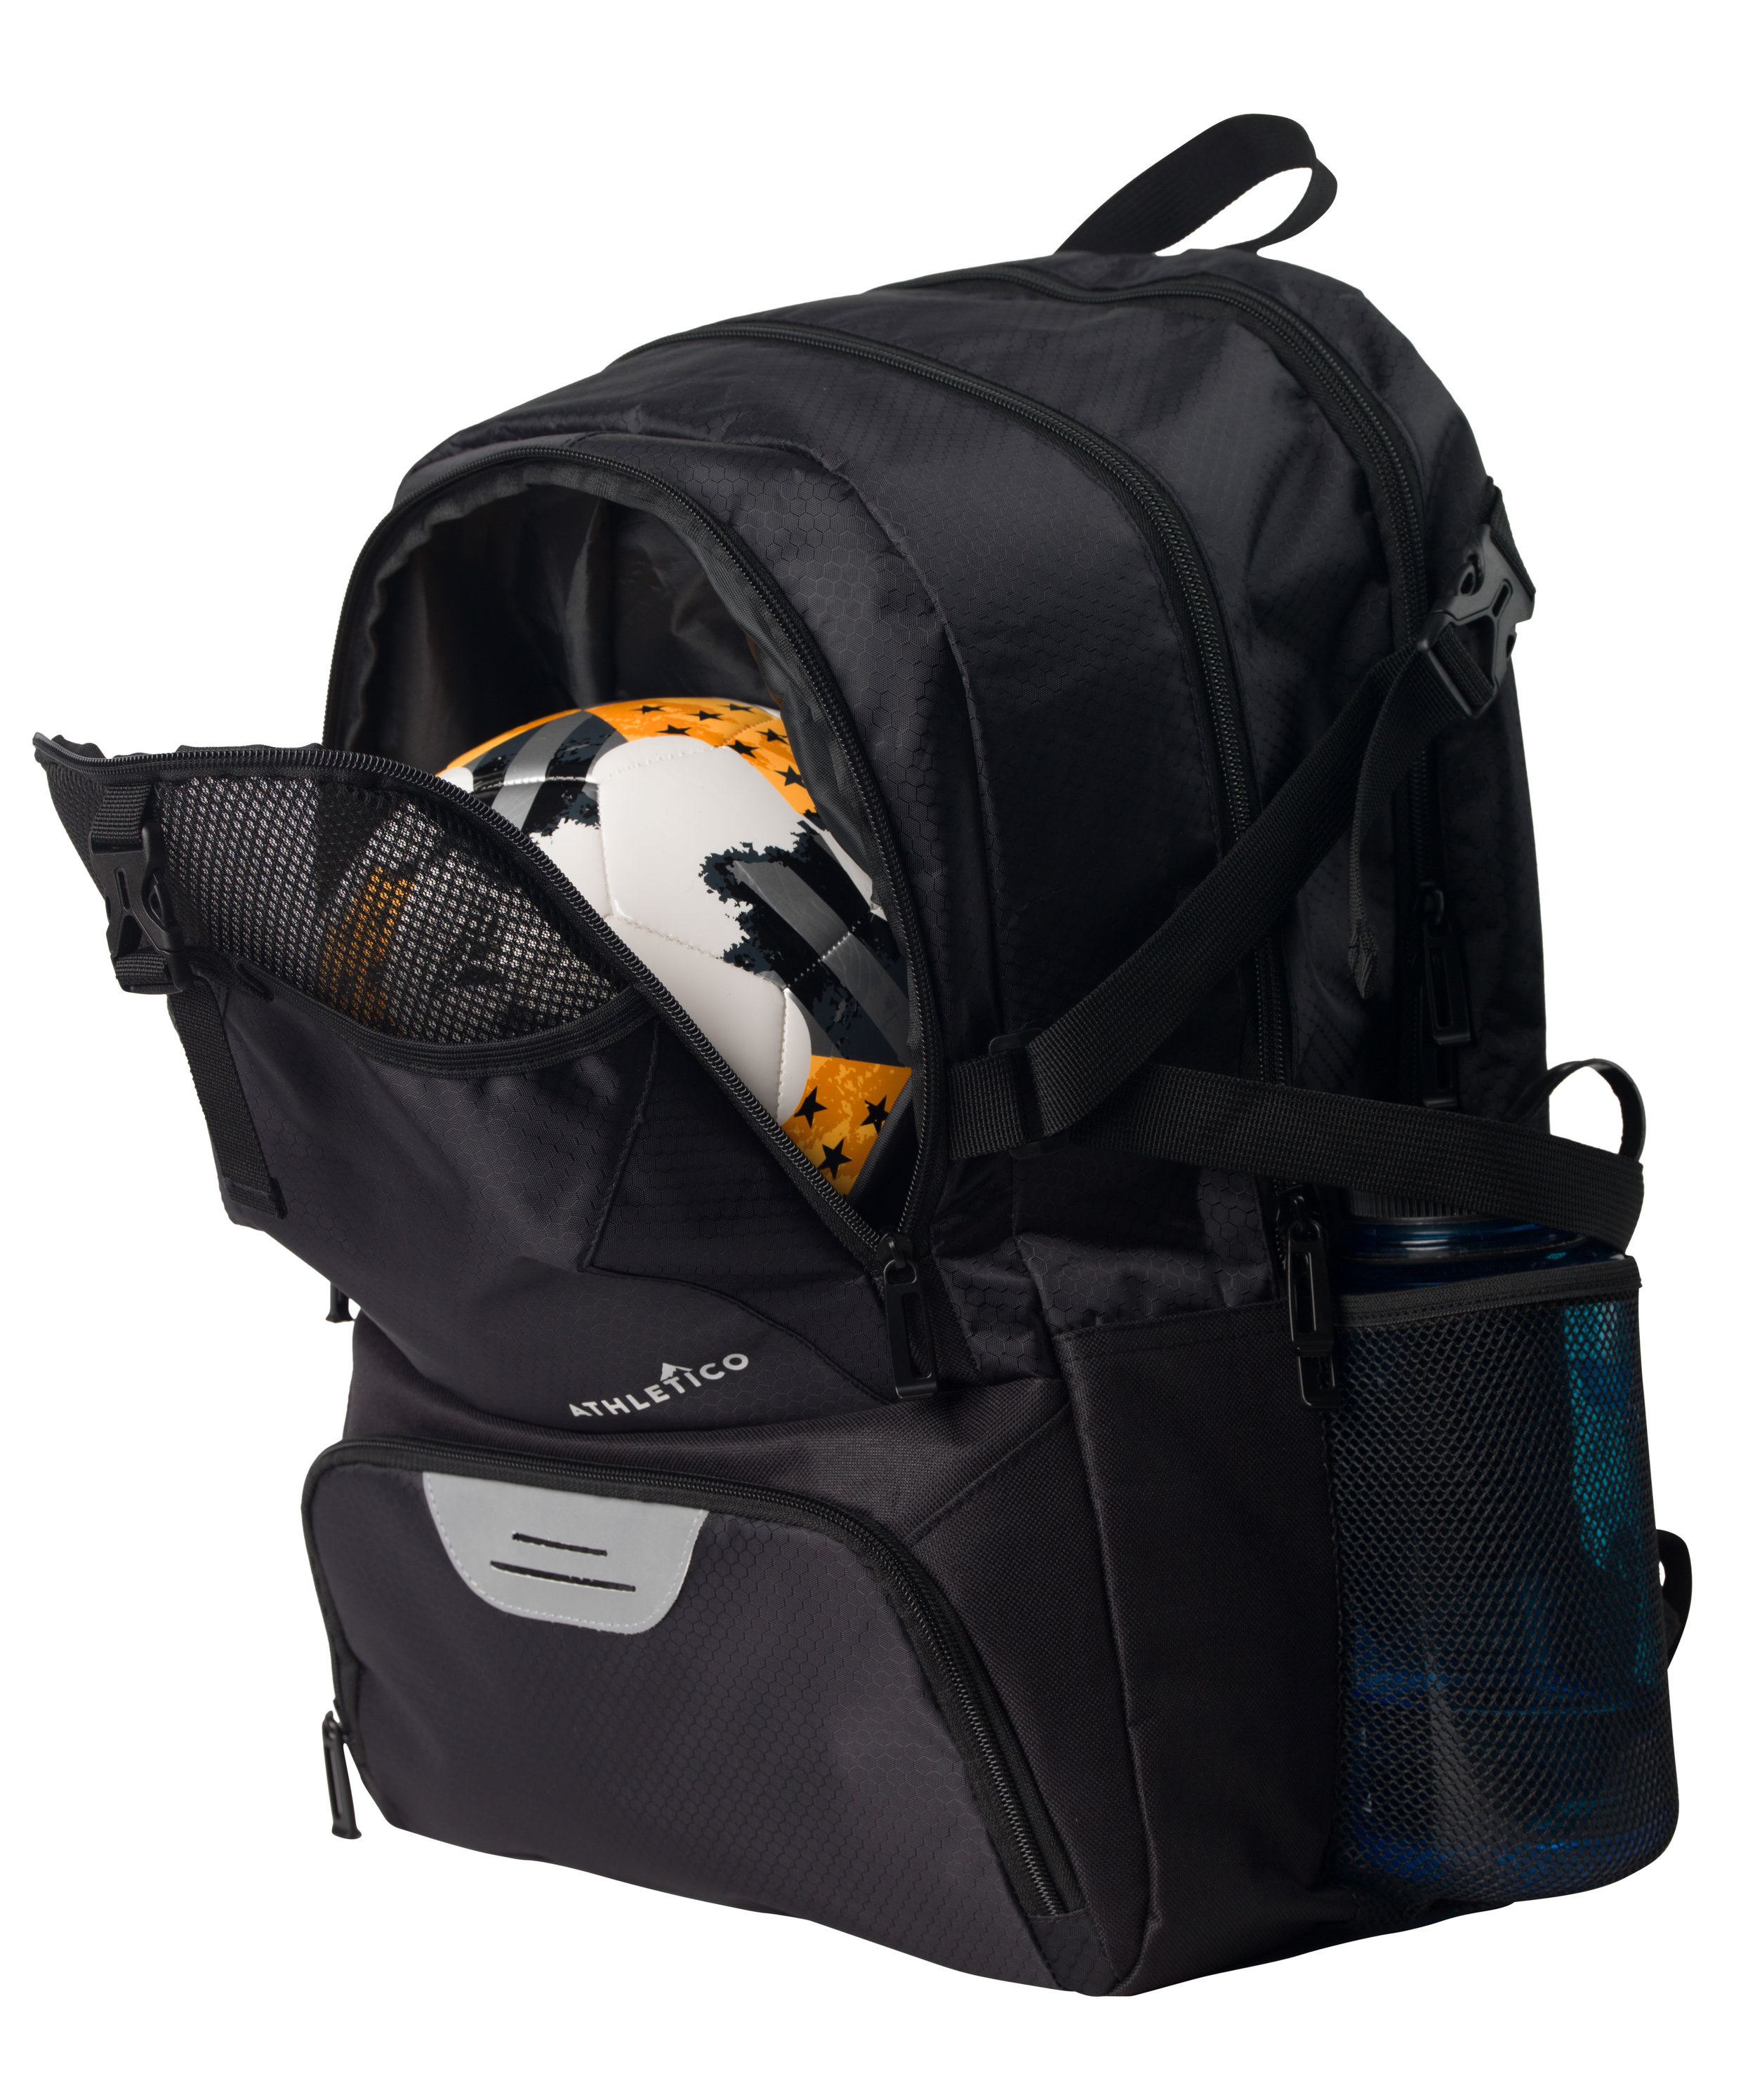 National - Soccer Backpack